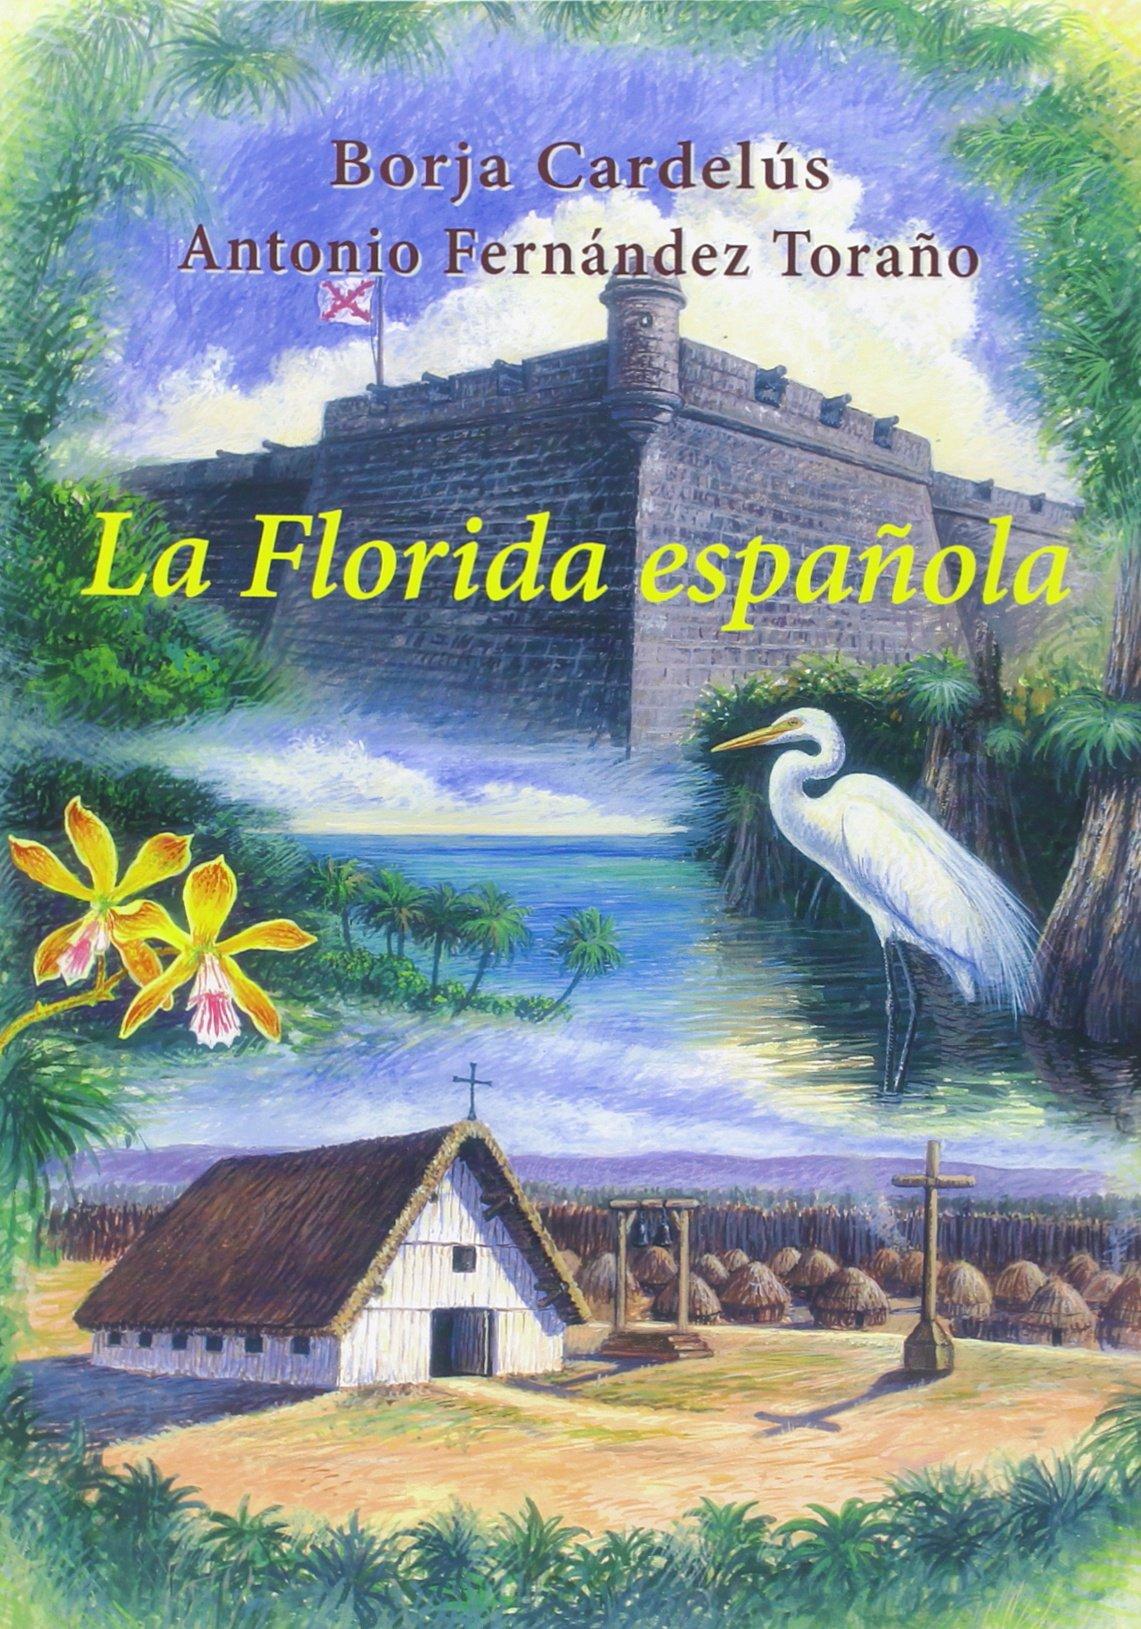 La Florida Española: Amazon.es: Borja Cardelús Muñoz-Seca, Antonio Fernández Toraño: Libros